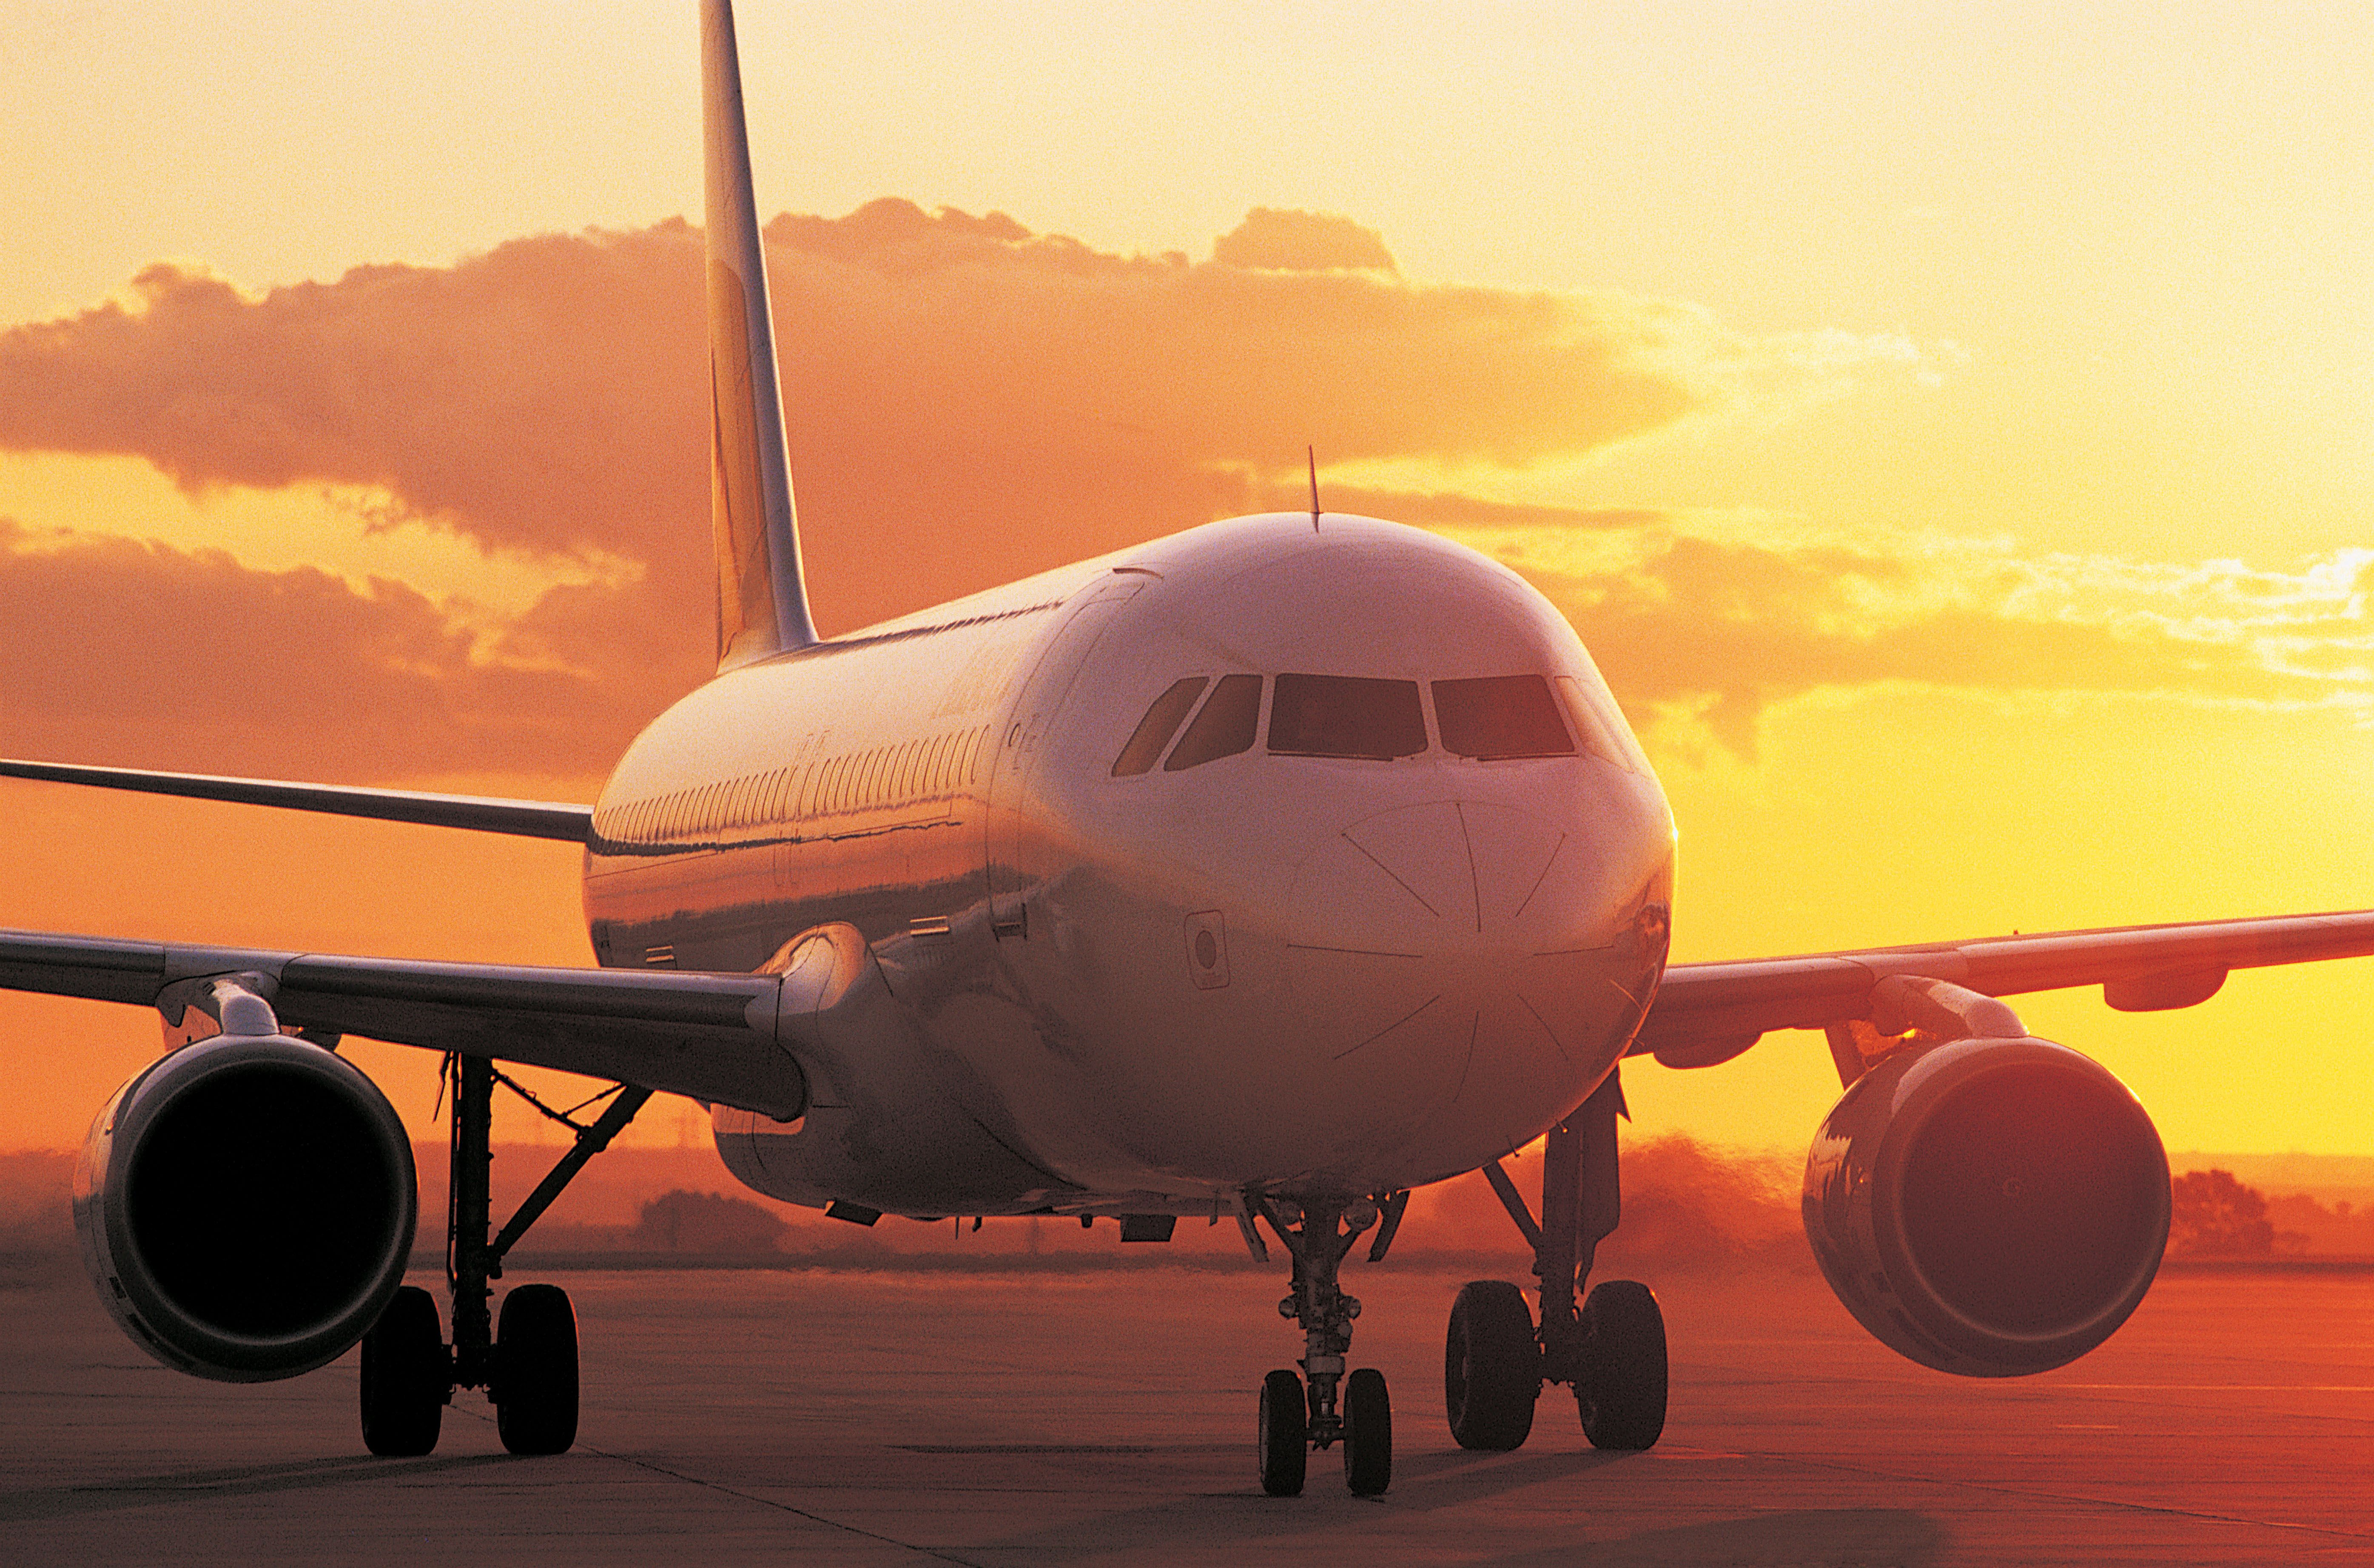 Book Mumbai To Kolkata Flights At Rock Bottom Prices